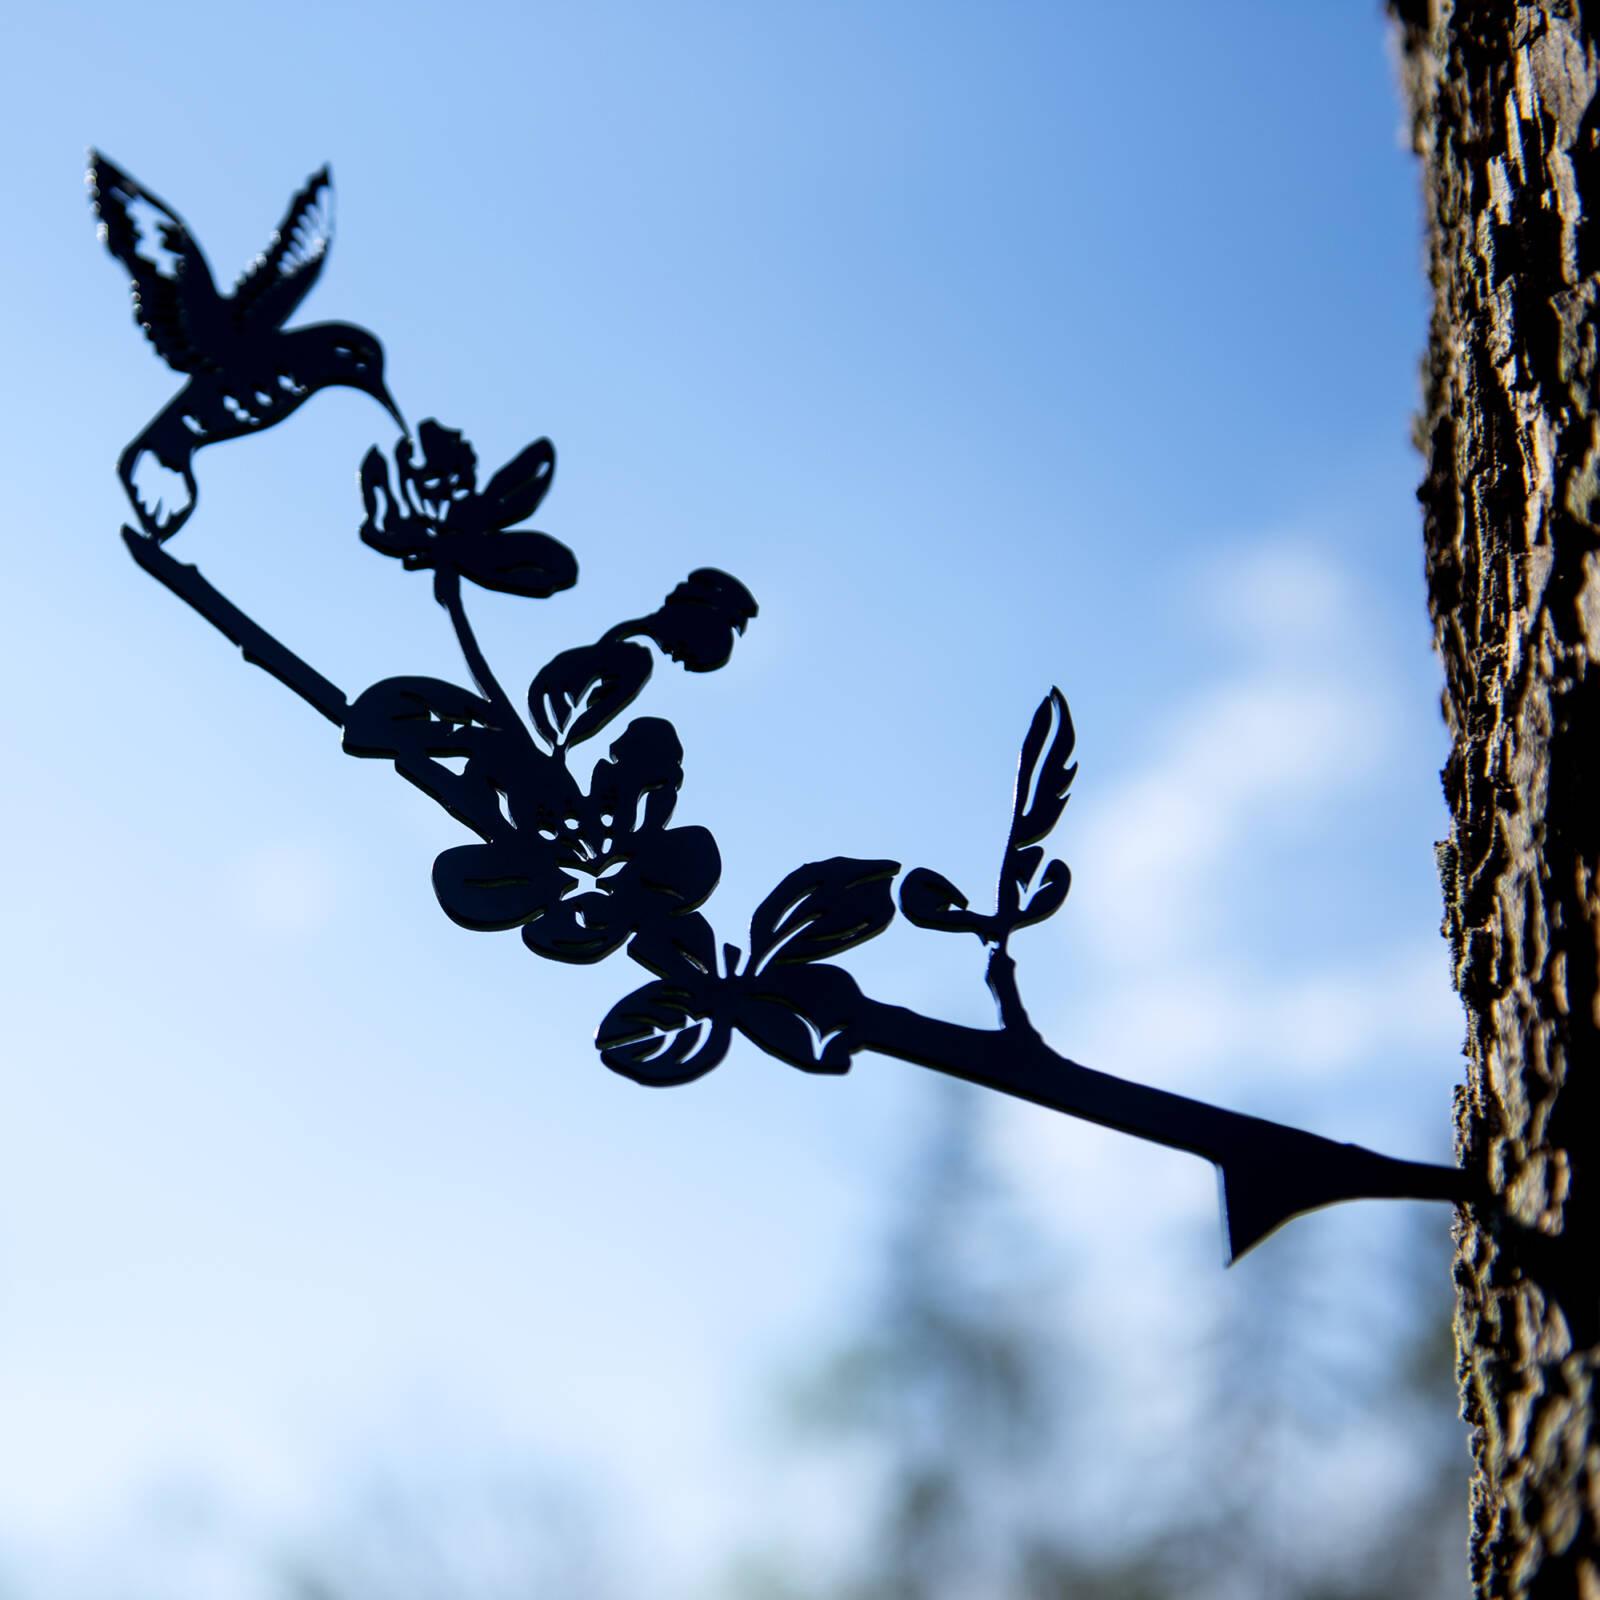 Metal hummingbird yard decor product photo for amazon photographed by Robintek Photography